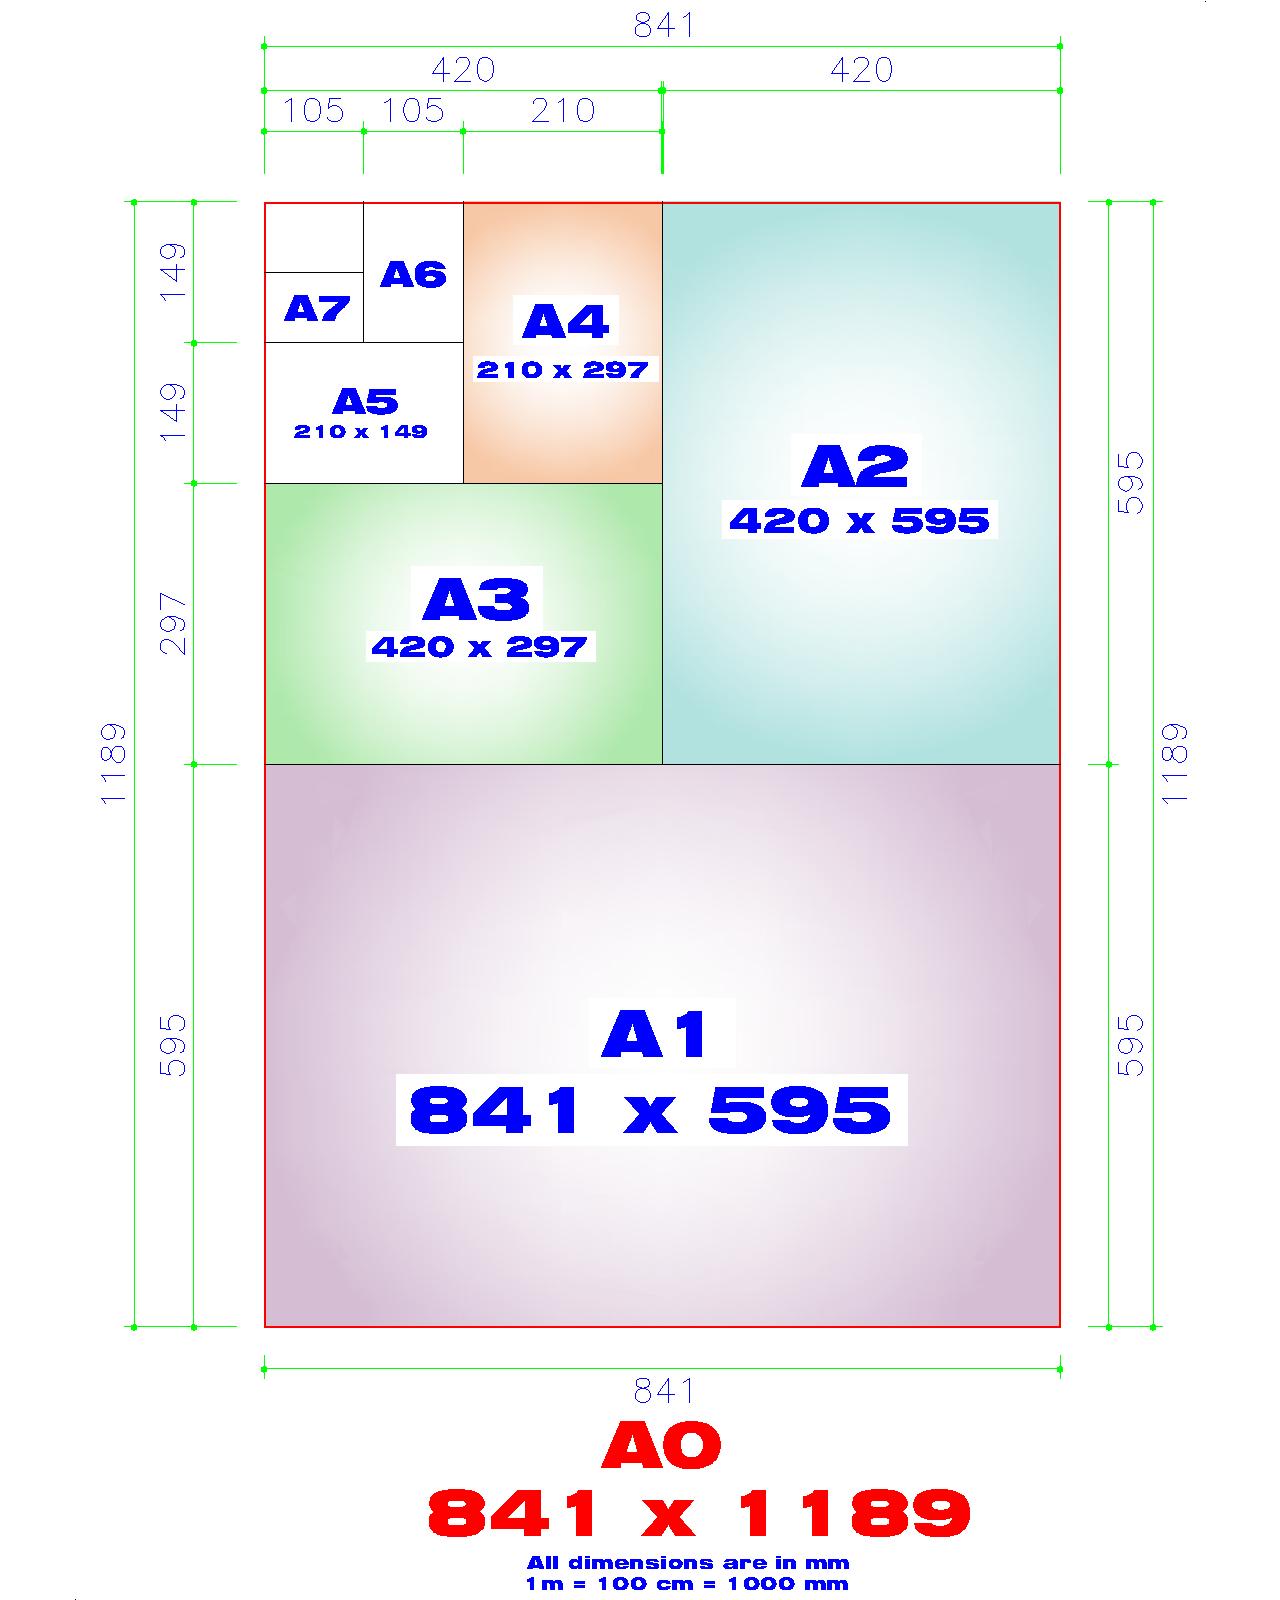 Standard poster pixel size